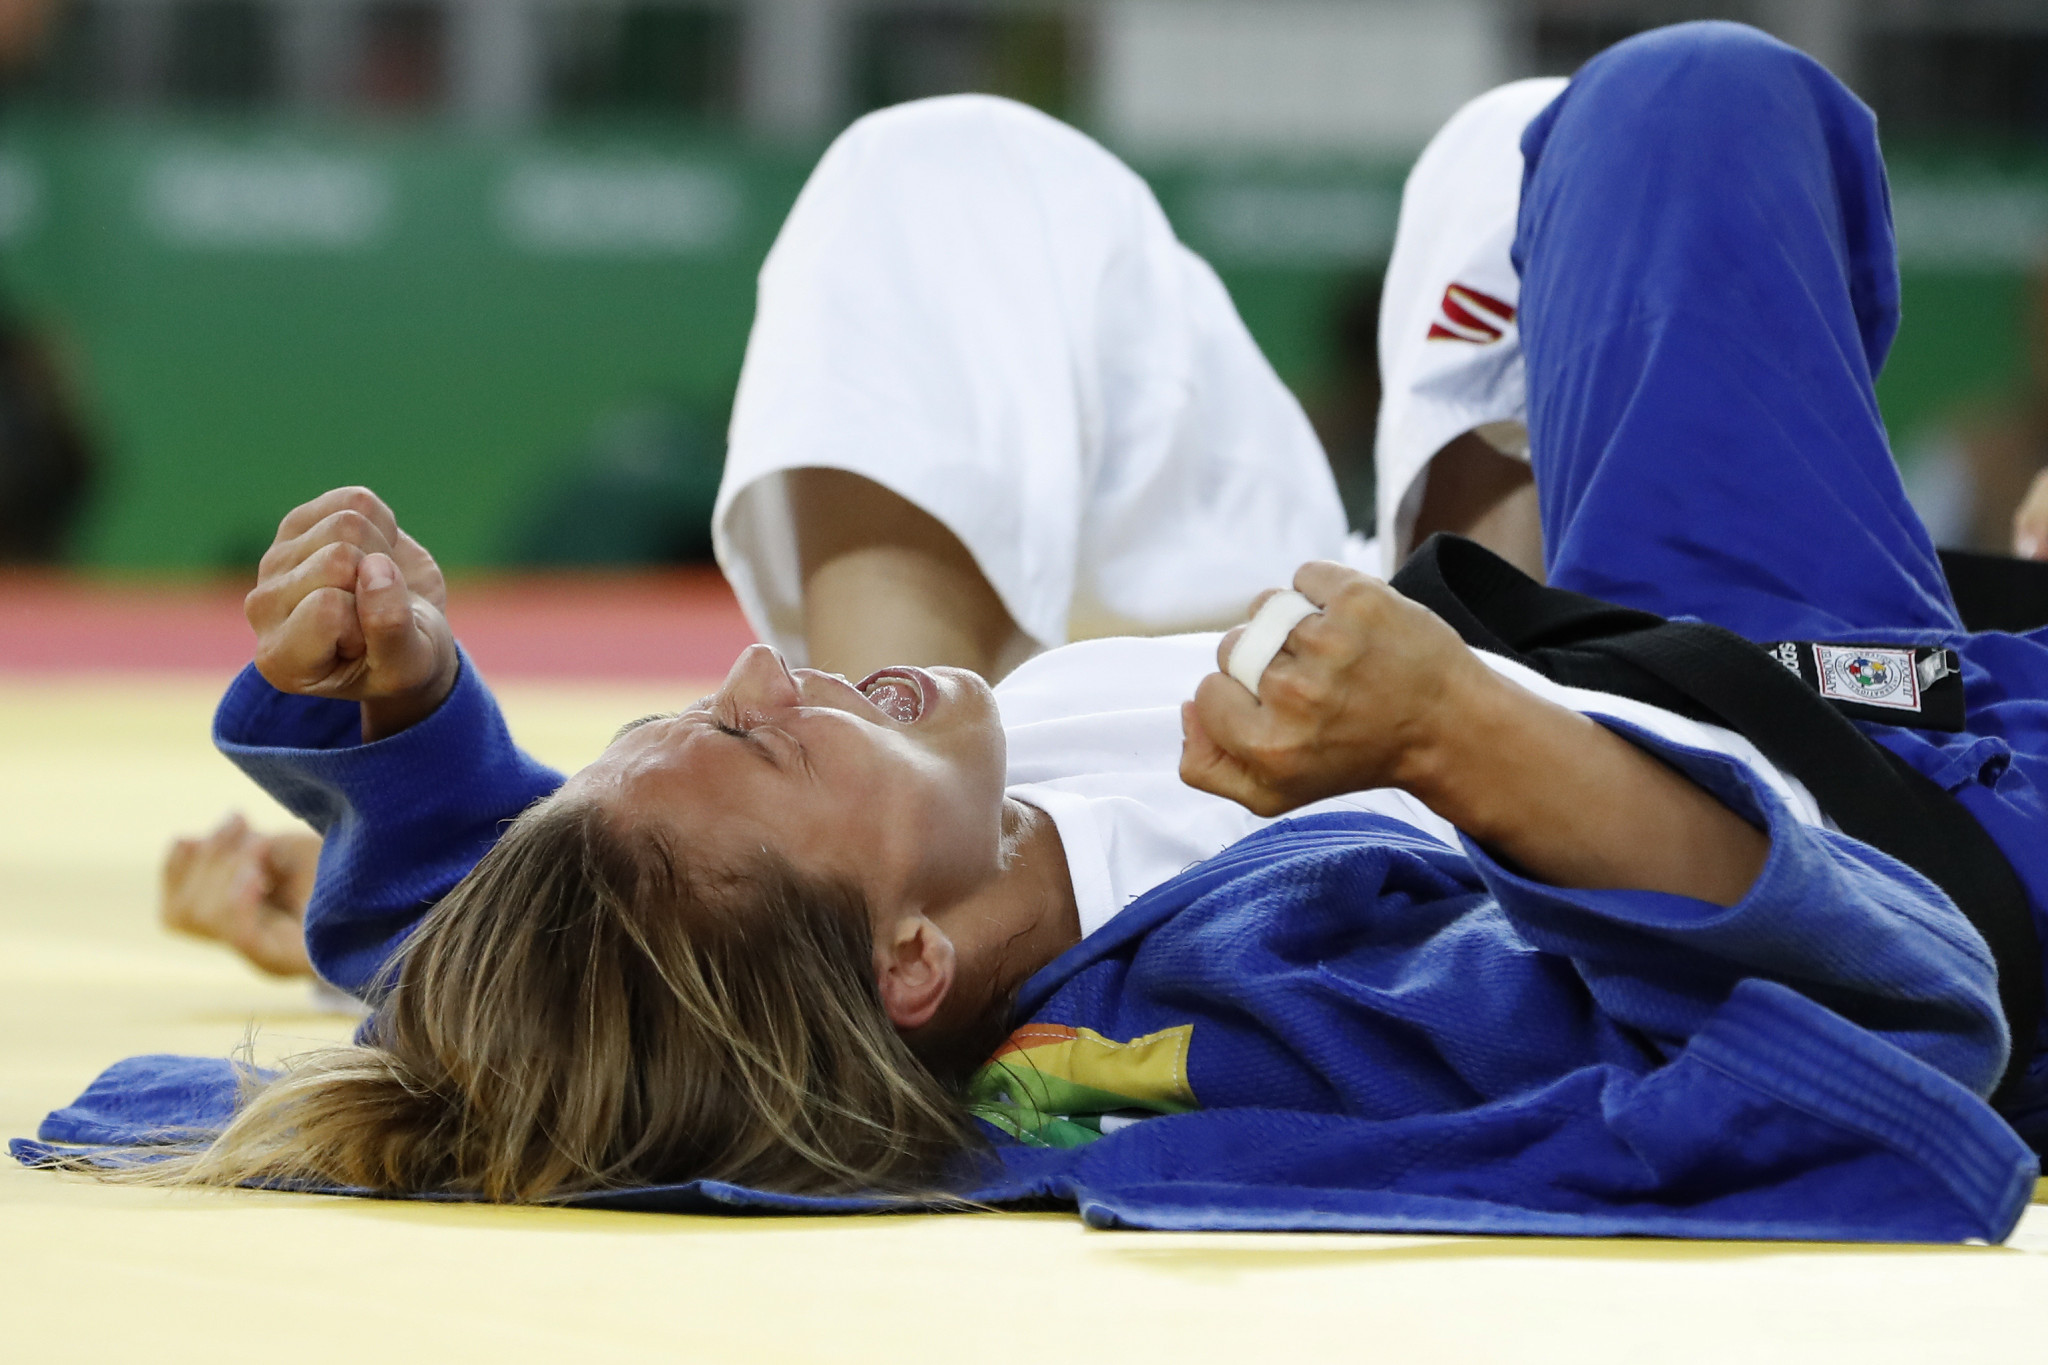 Canadian judoka earn three golds as Pan American Championships begins